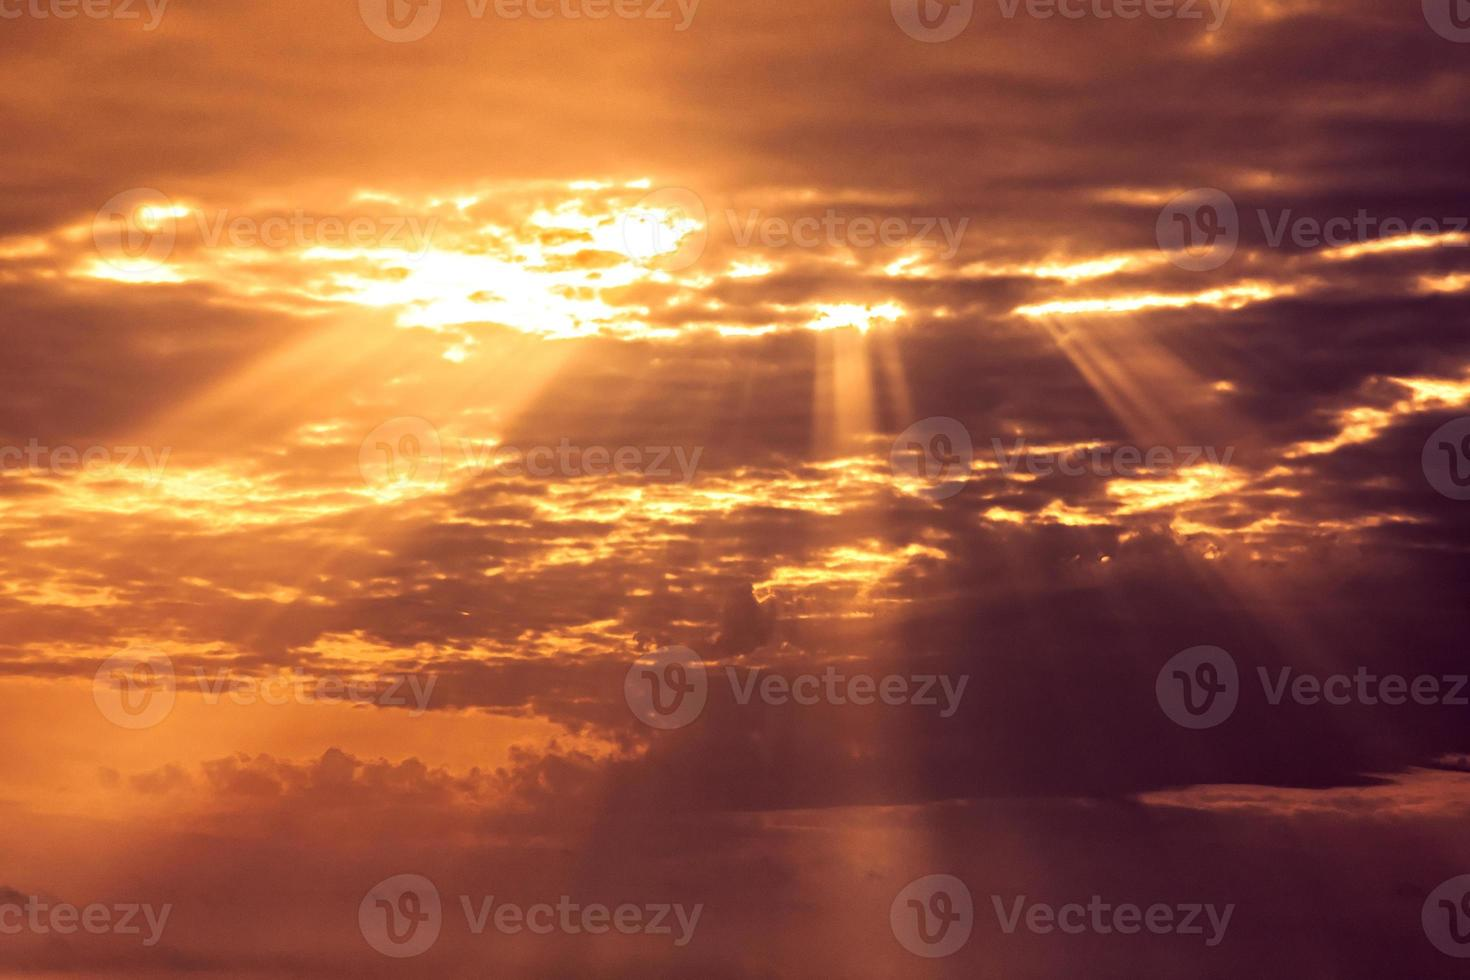 sunset sky with light rays photo